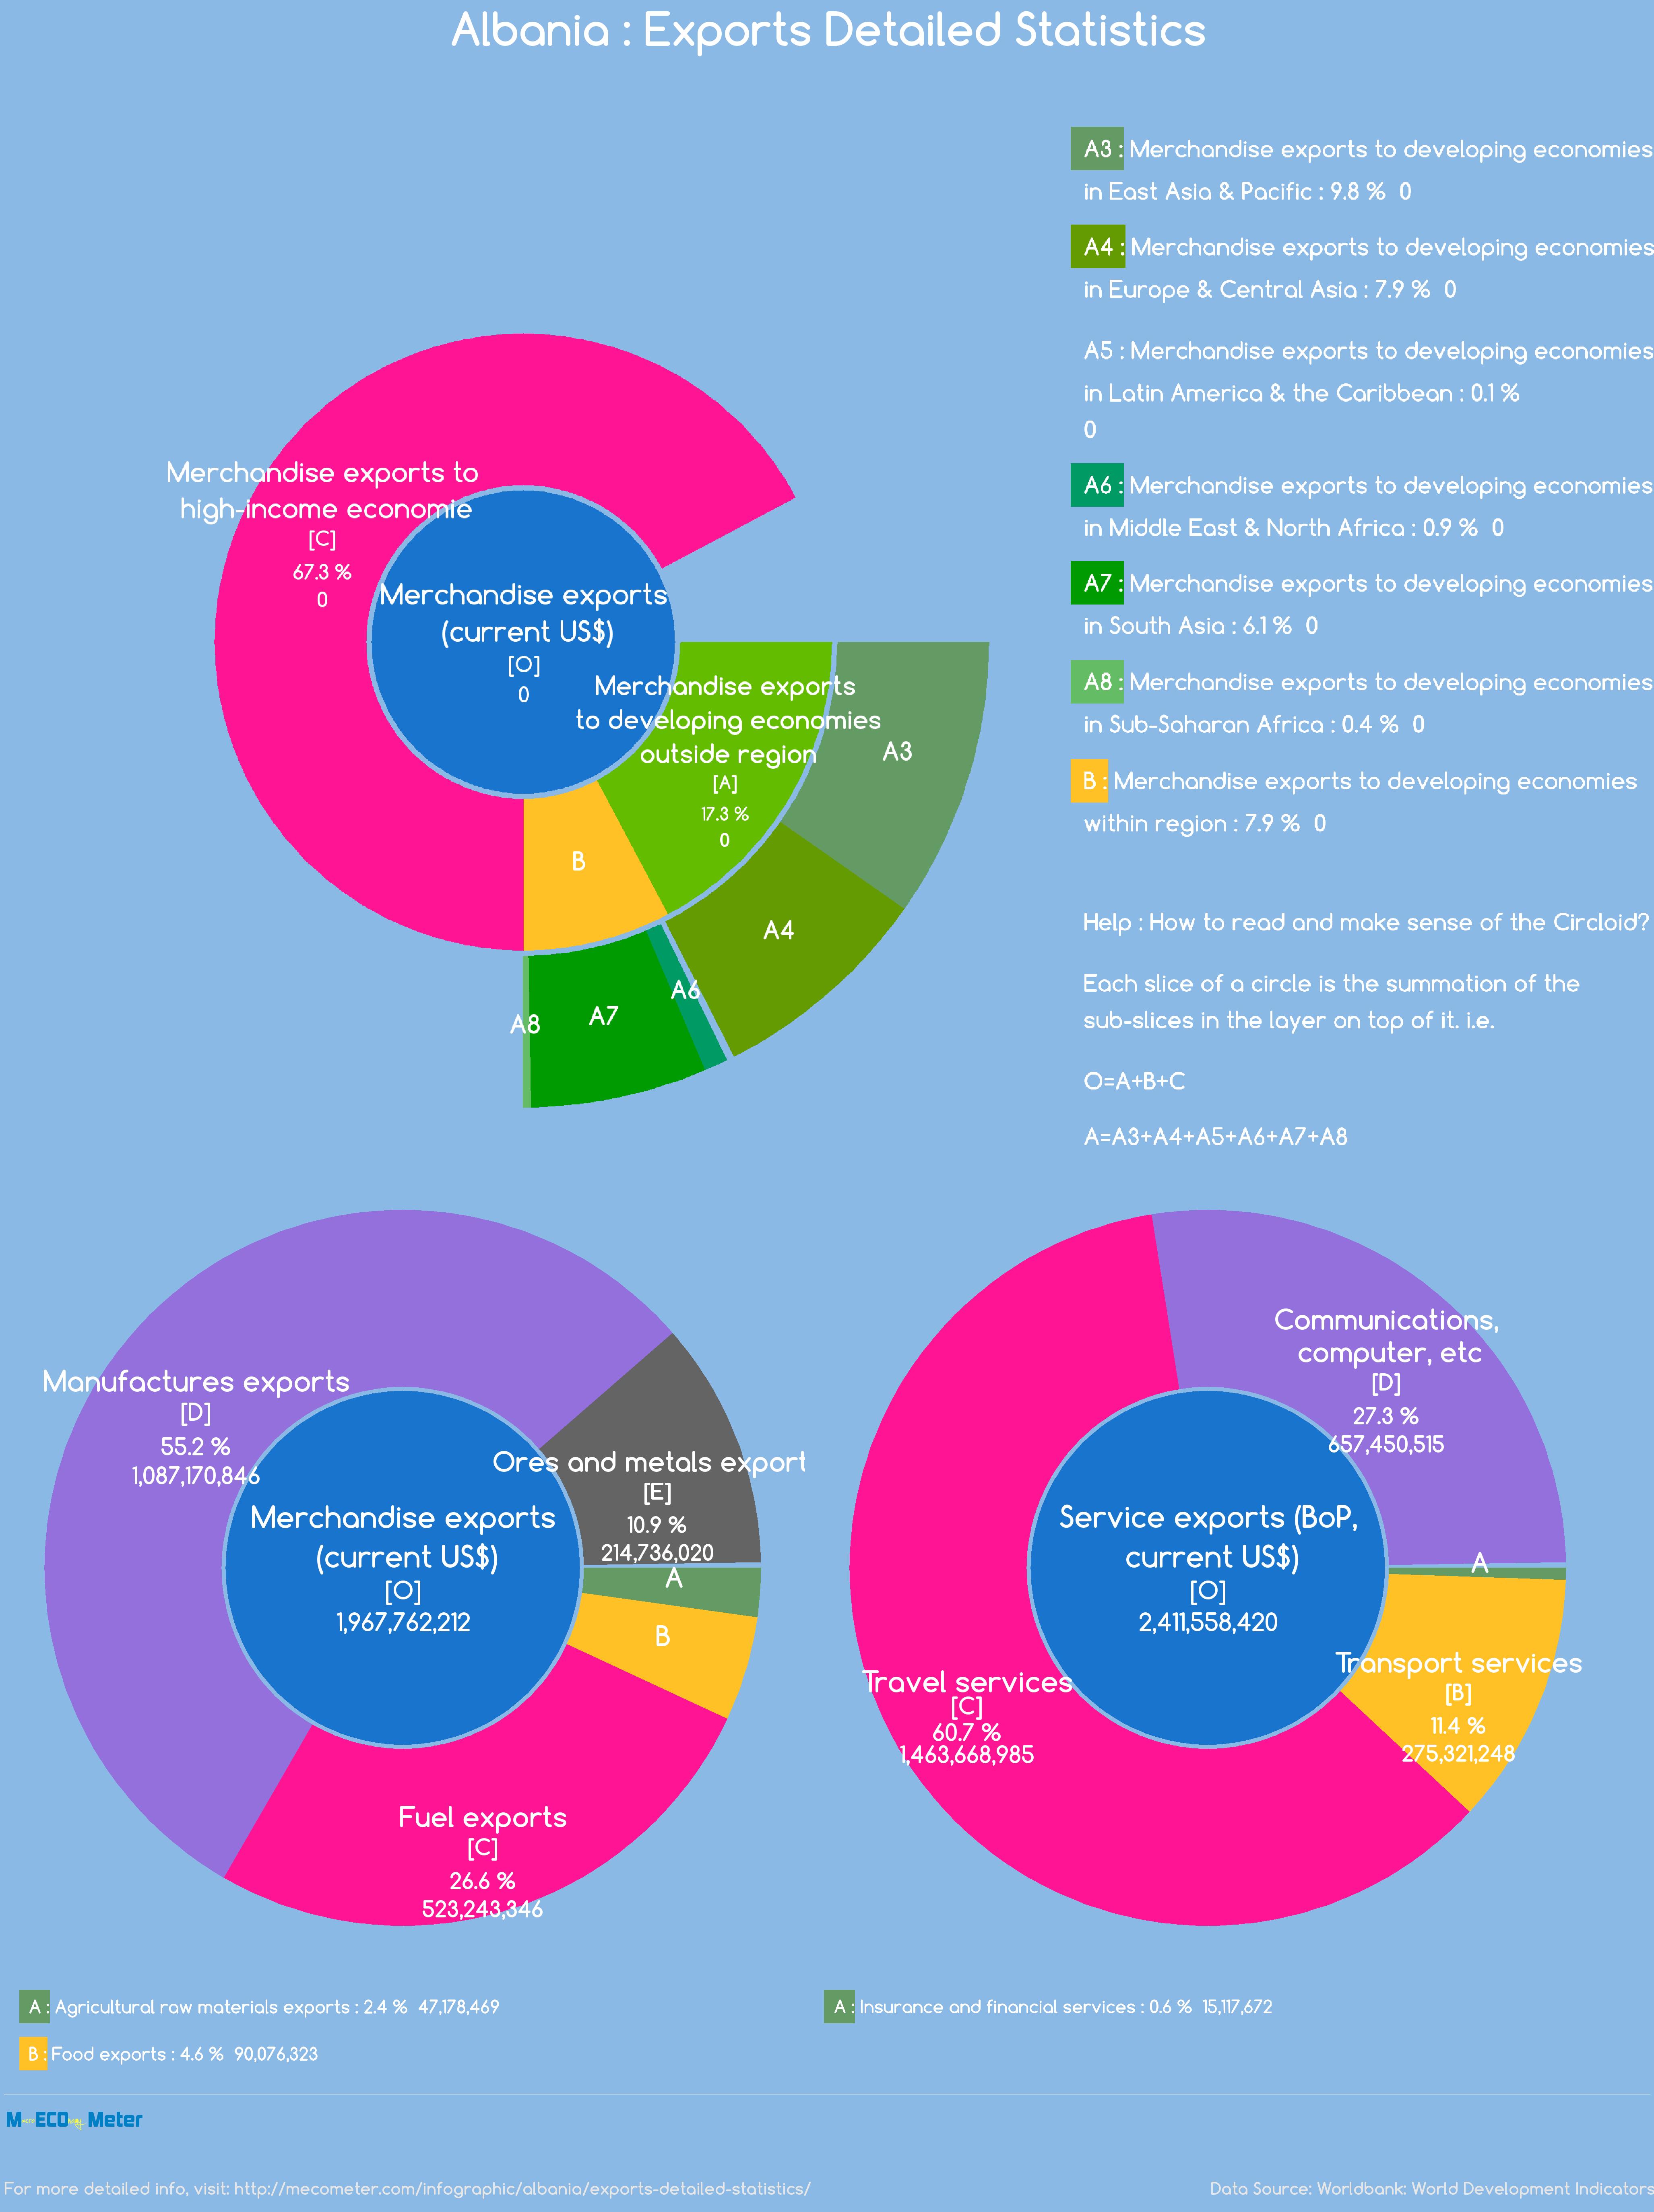 Albania : Exports Detailed Statistics